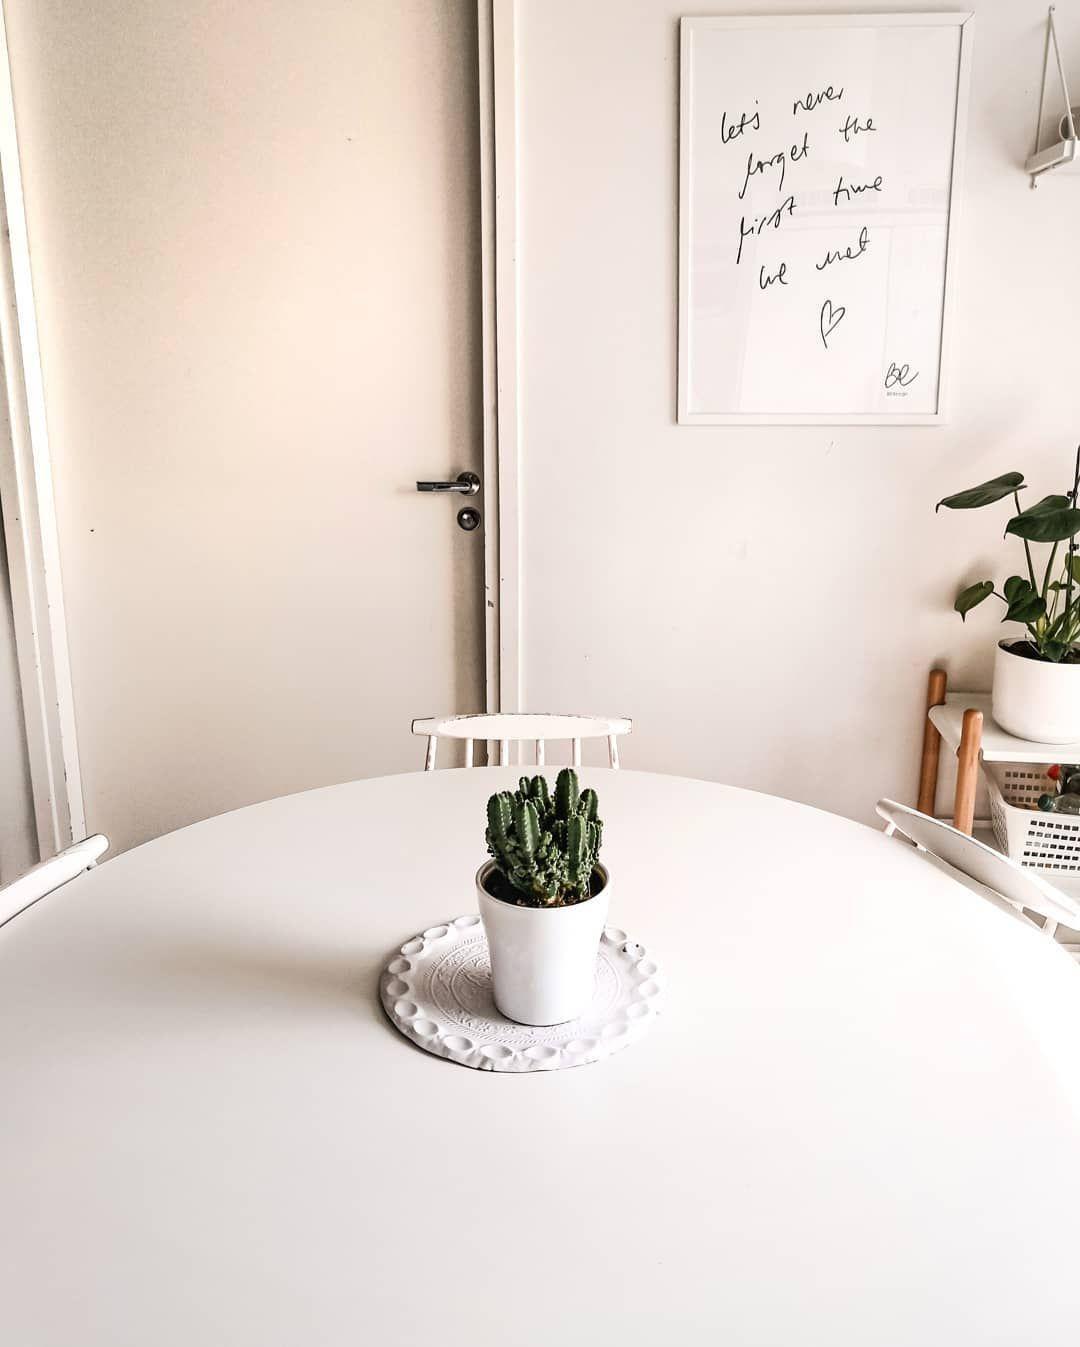 #homedecor #homeinterior #homeinspo #interiorinspiration #instahome #interior #decor #home #kitchen #kitchendesign... added to Google Drive